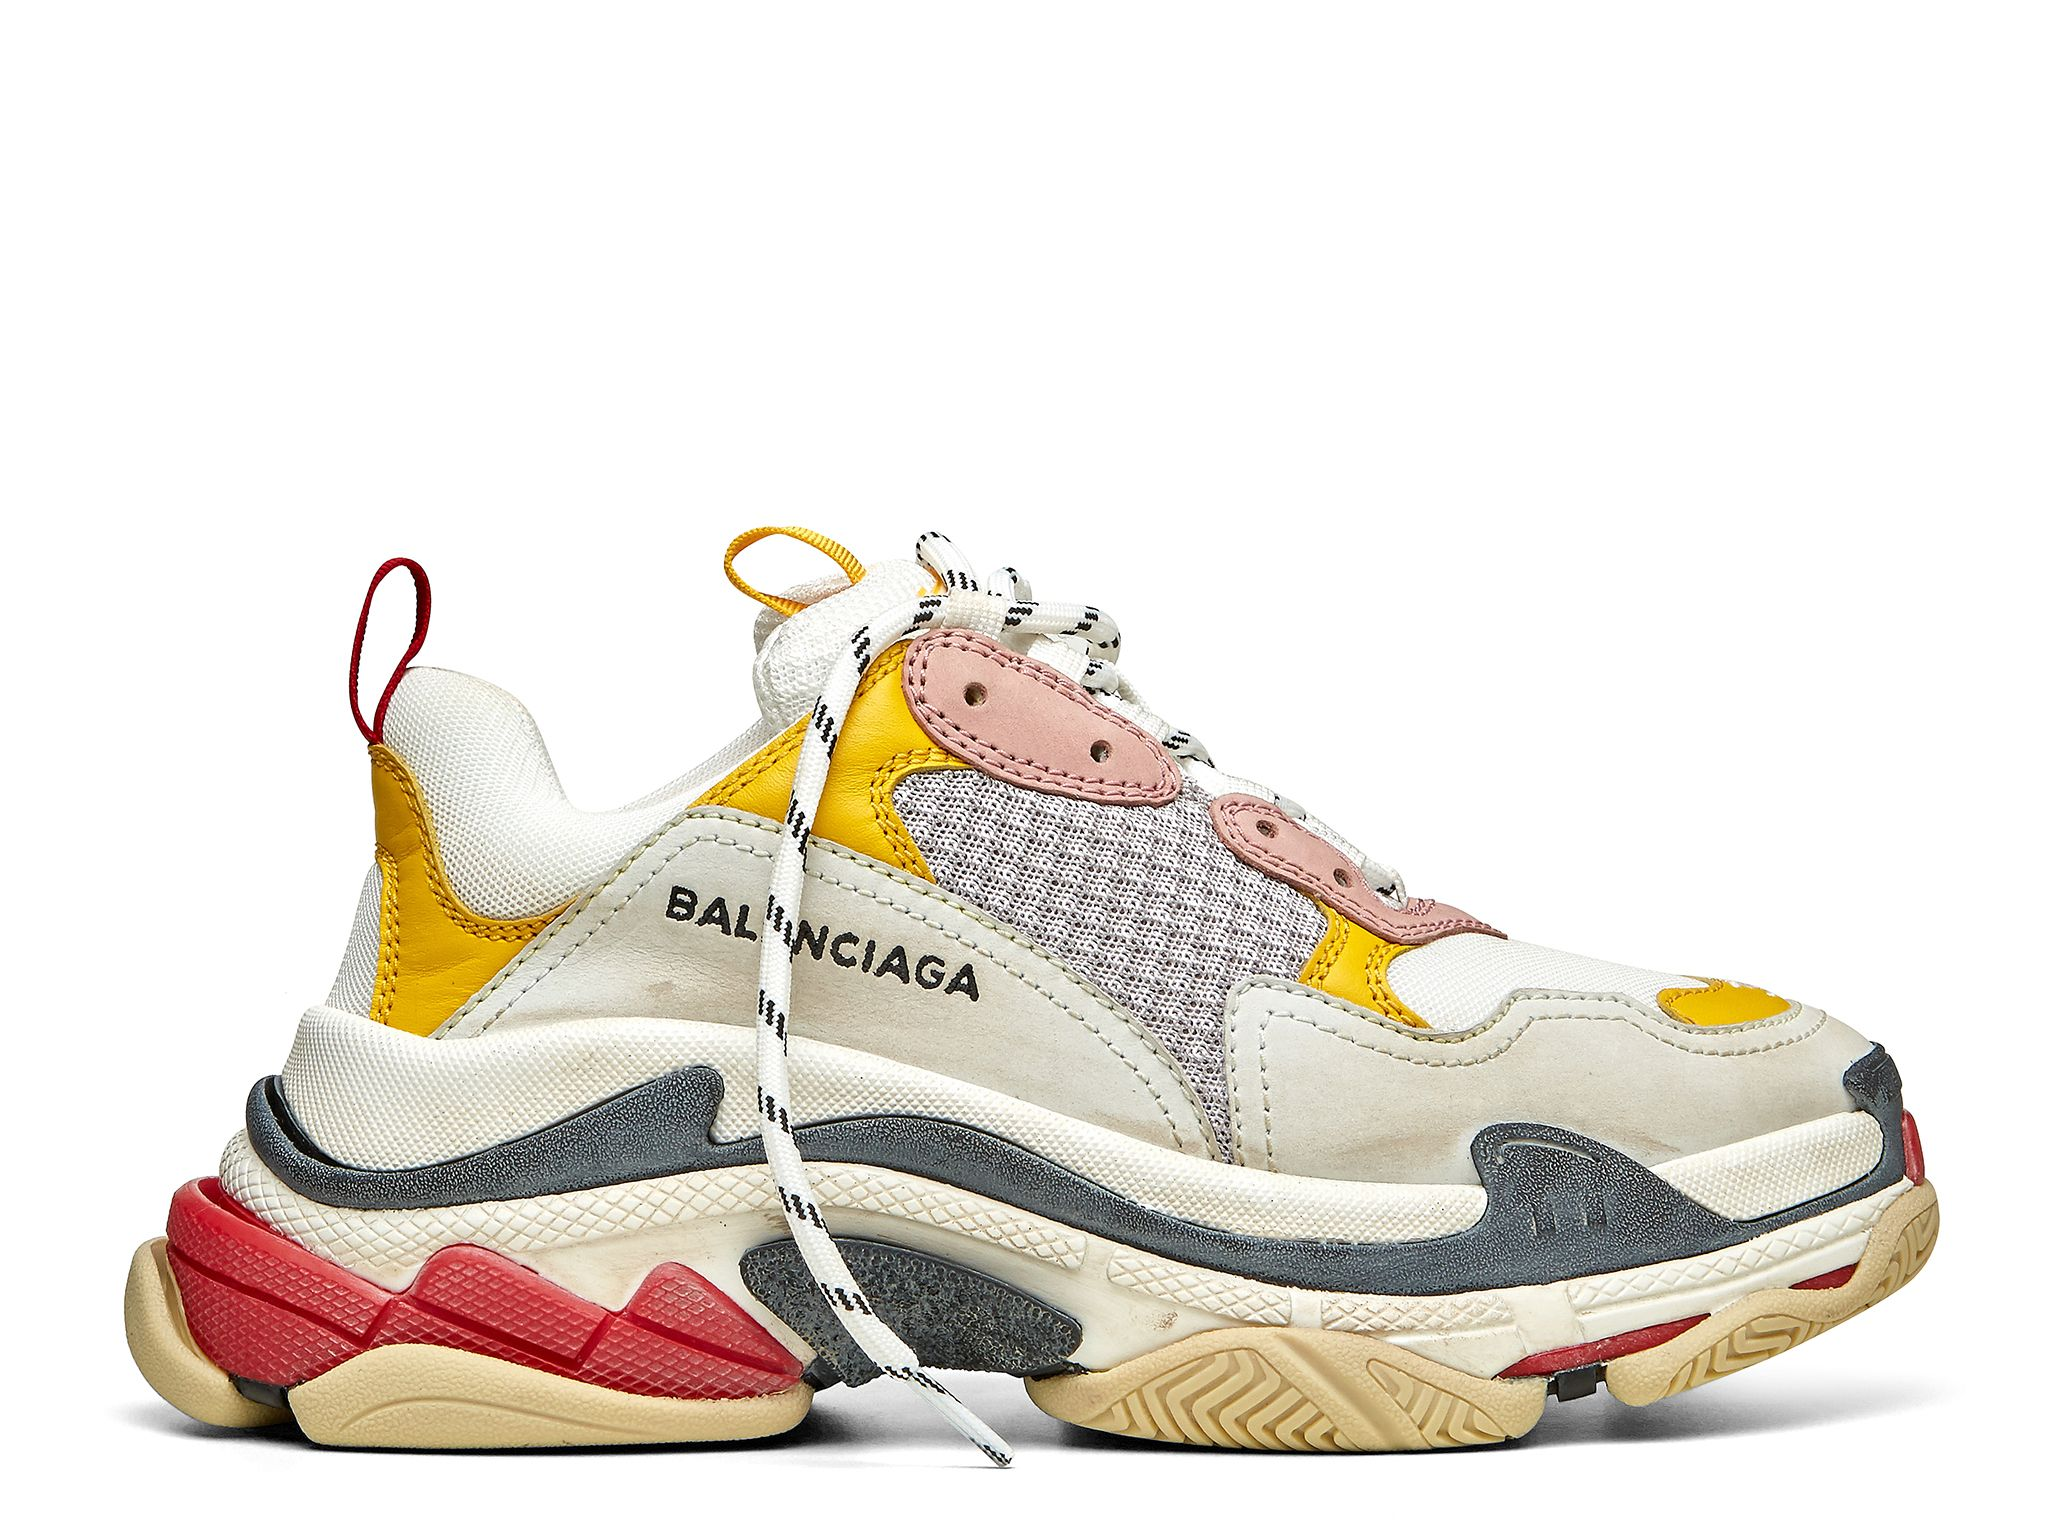 026be2b622f4 Balenciaga Wmns Triple S - Sneakerboy